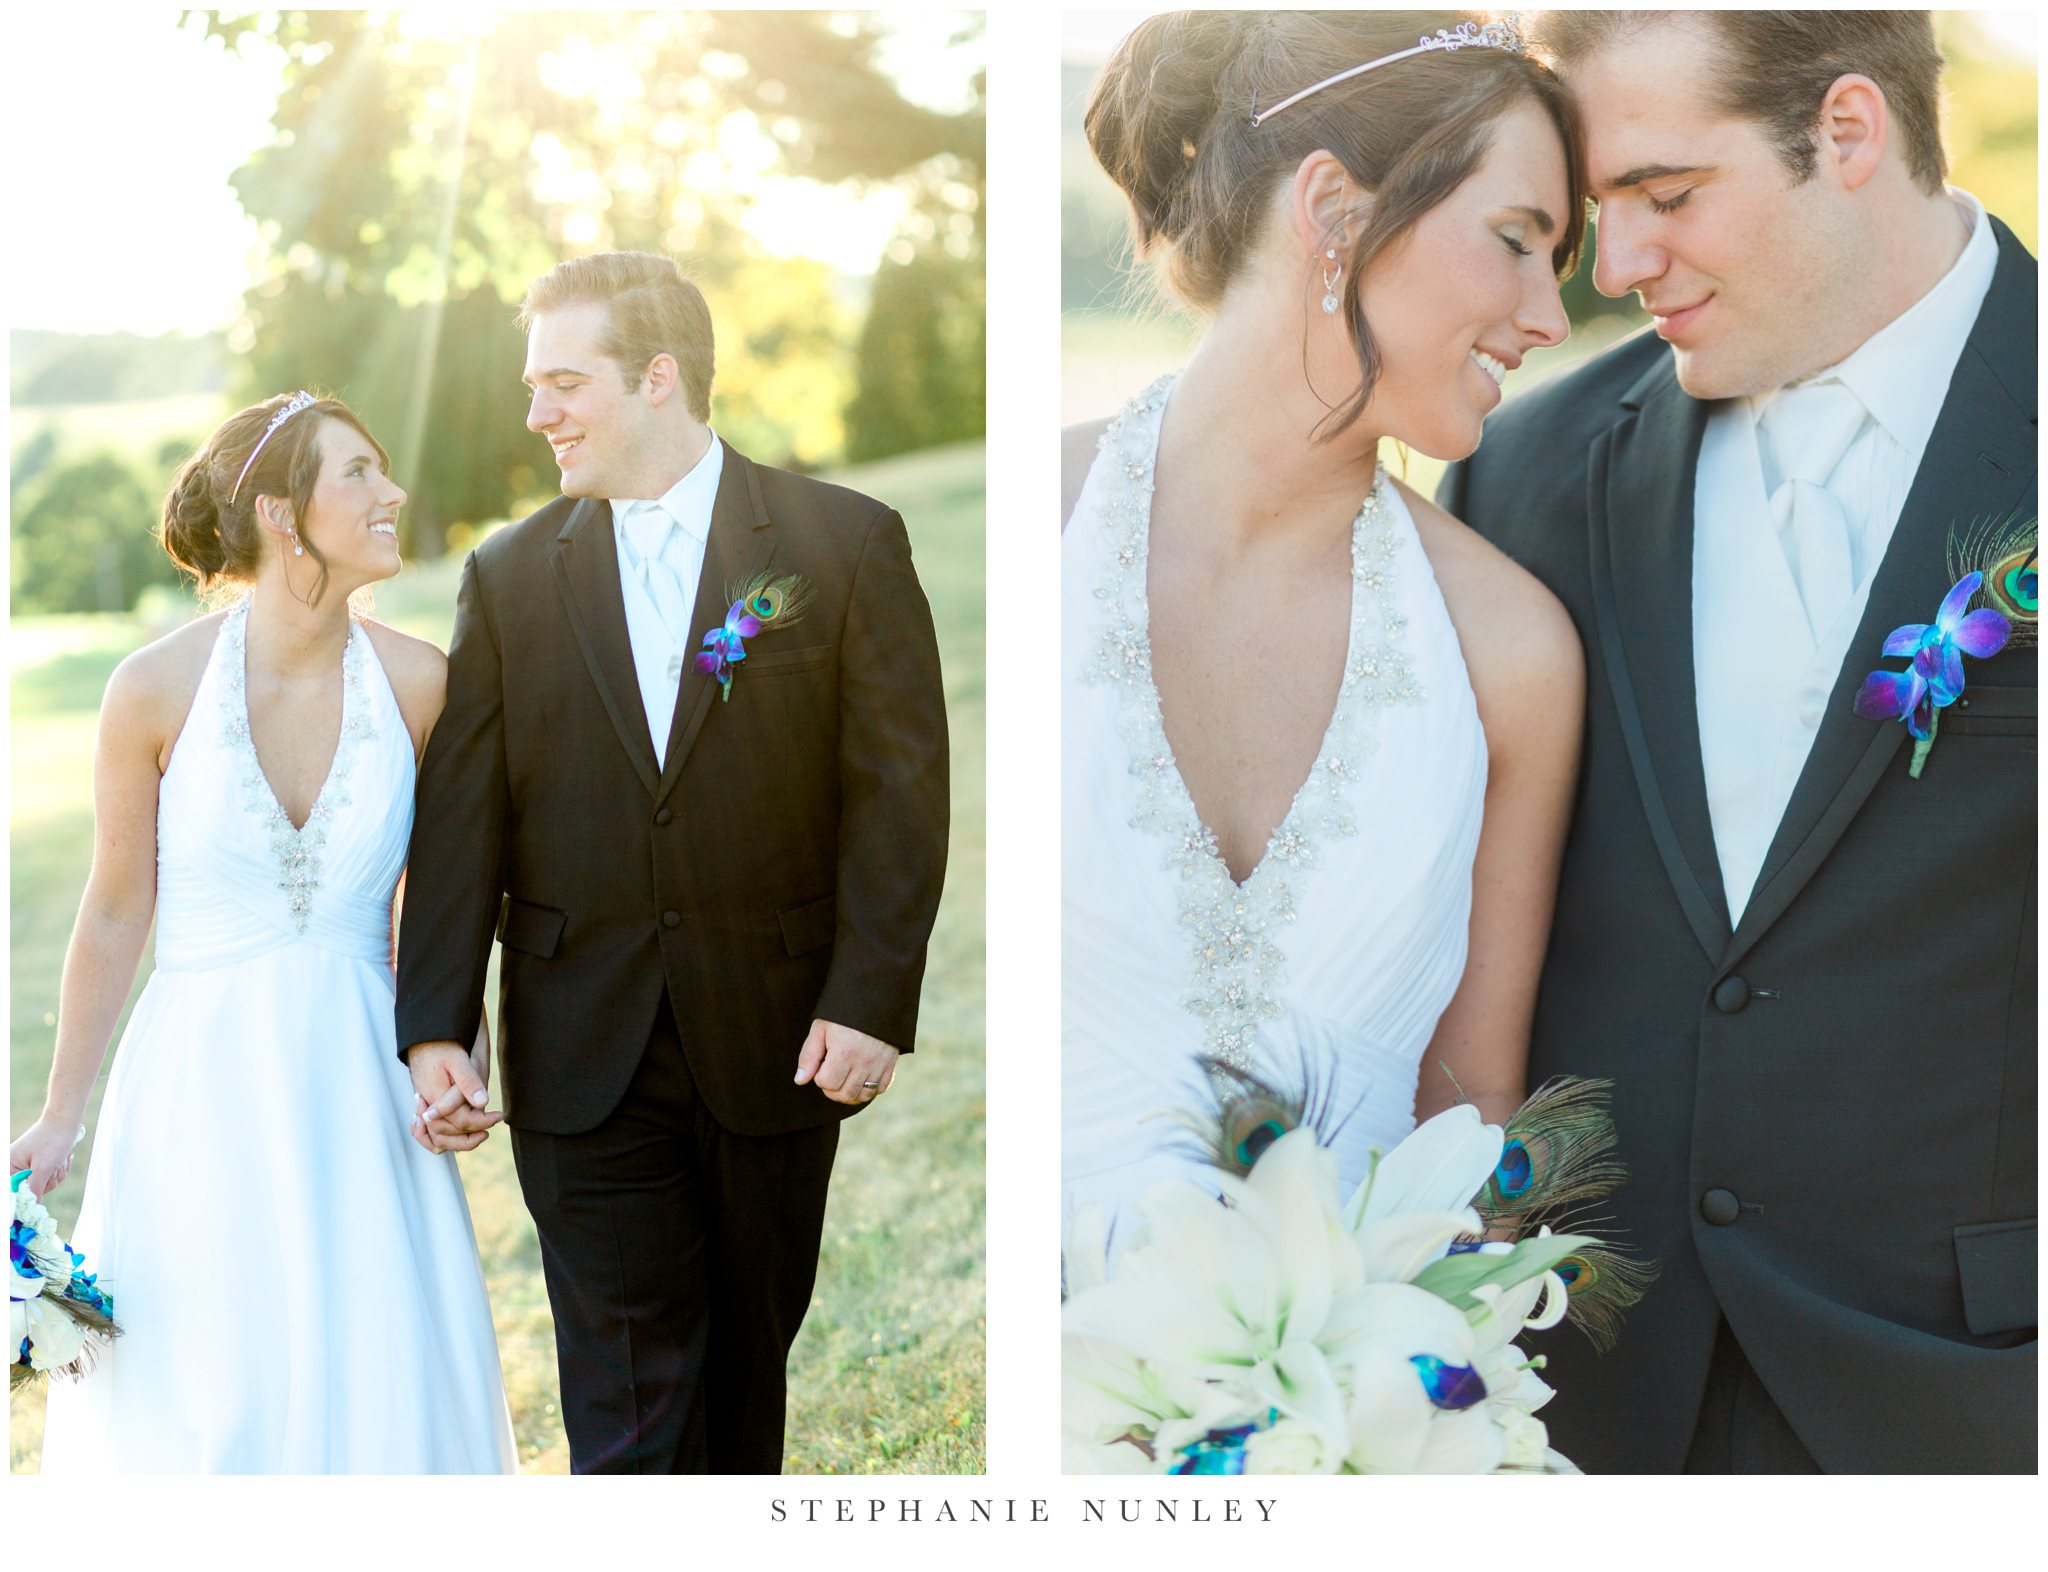 fine-art-destination-wedding-photographer-0080.jpg